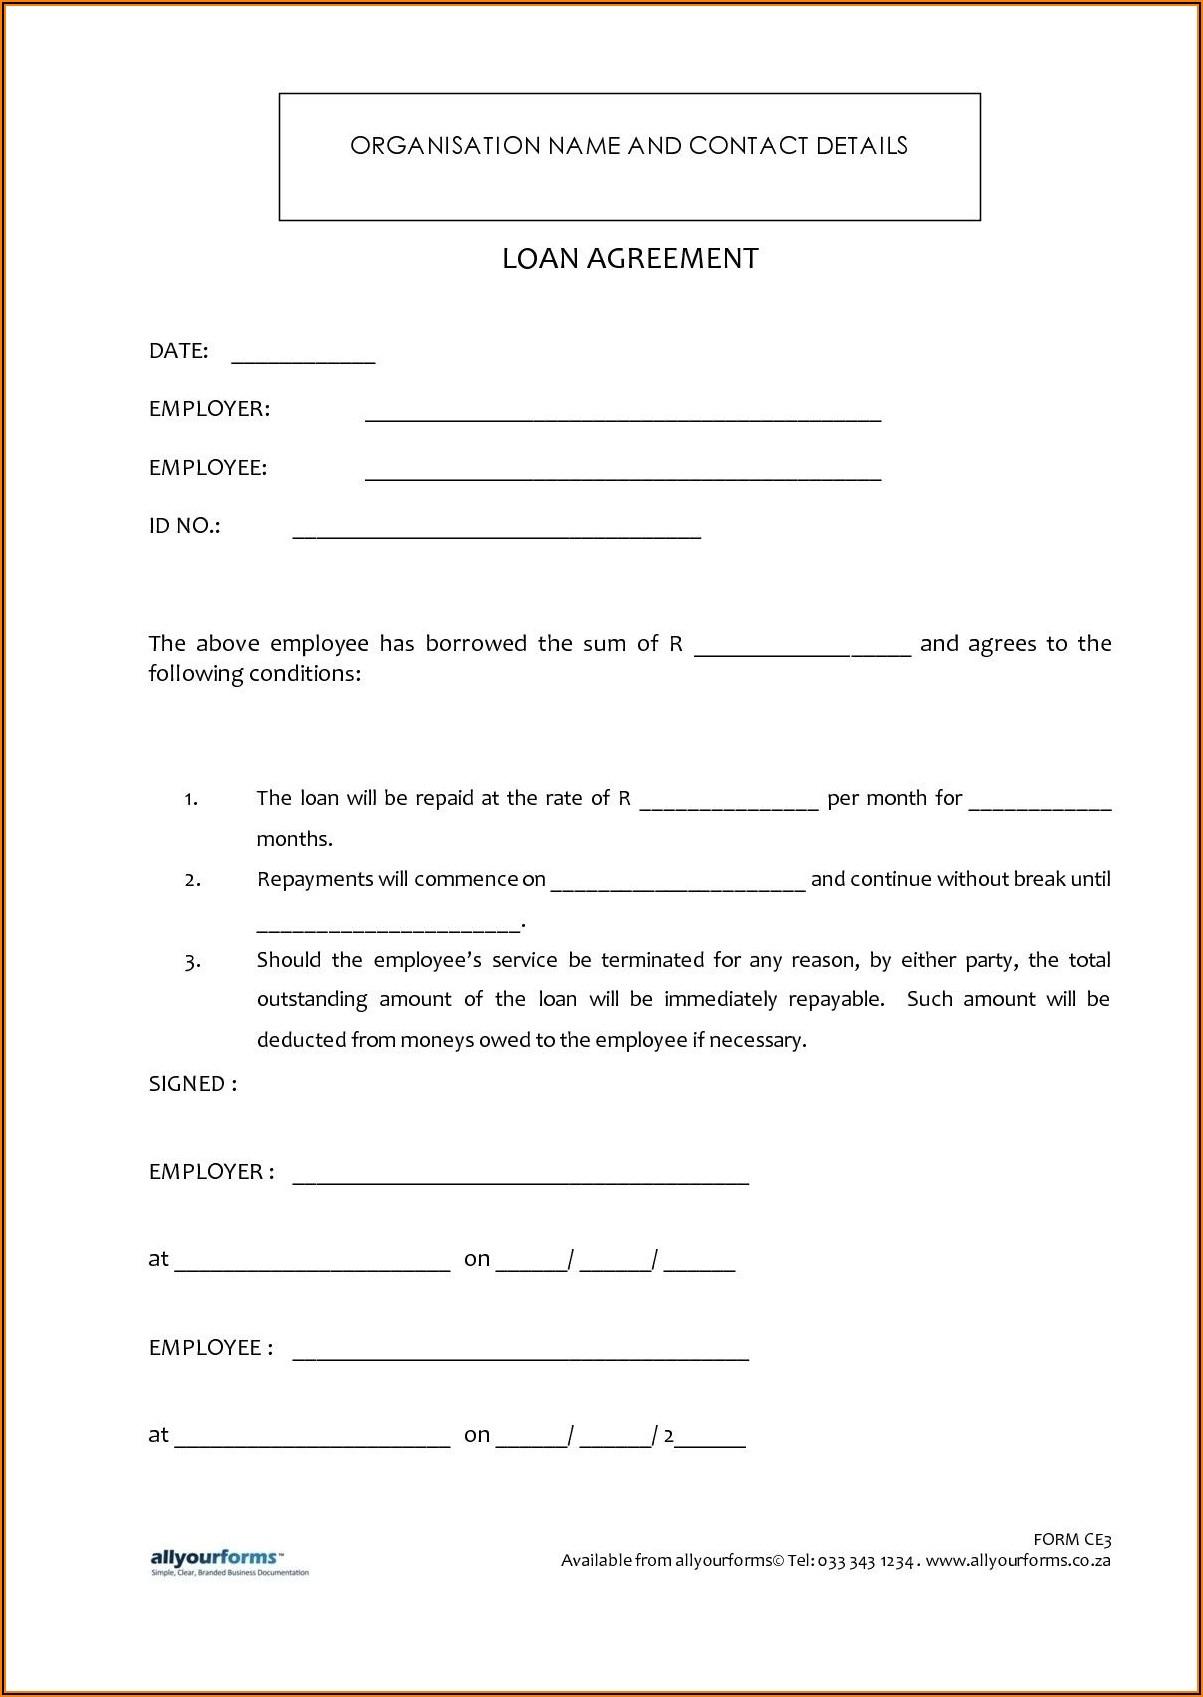 Staff Loan Agreement Template Word